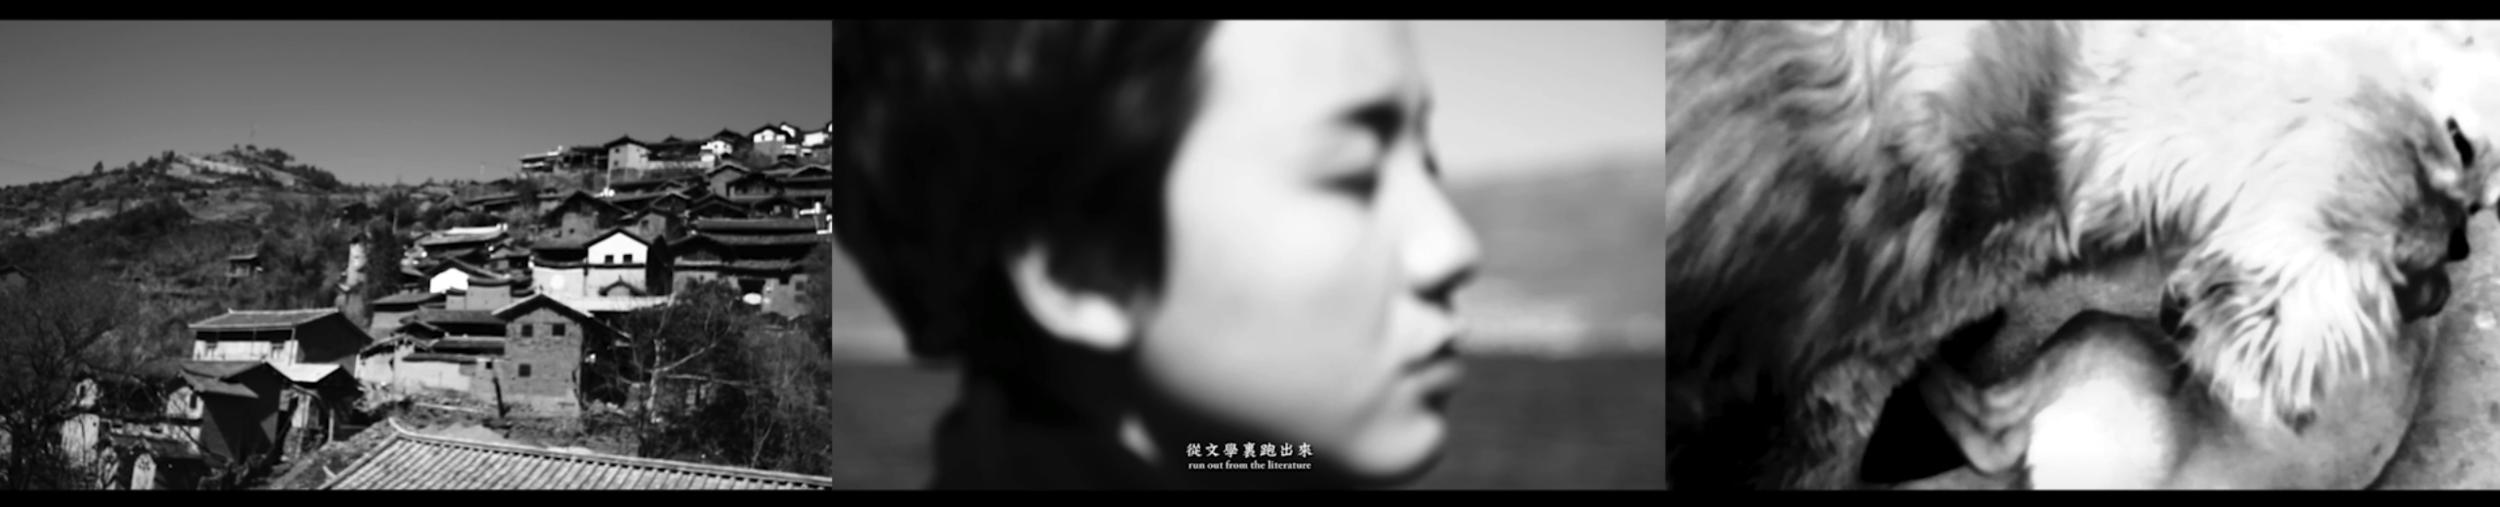 袁可如 Yuan Keru | 云龙绮梦 A Salted Entounter 三屏幕影像装置Three-screen video installation |时长 Duration 15m14s | 5+2AP | 2014-2.png